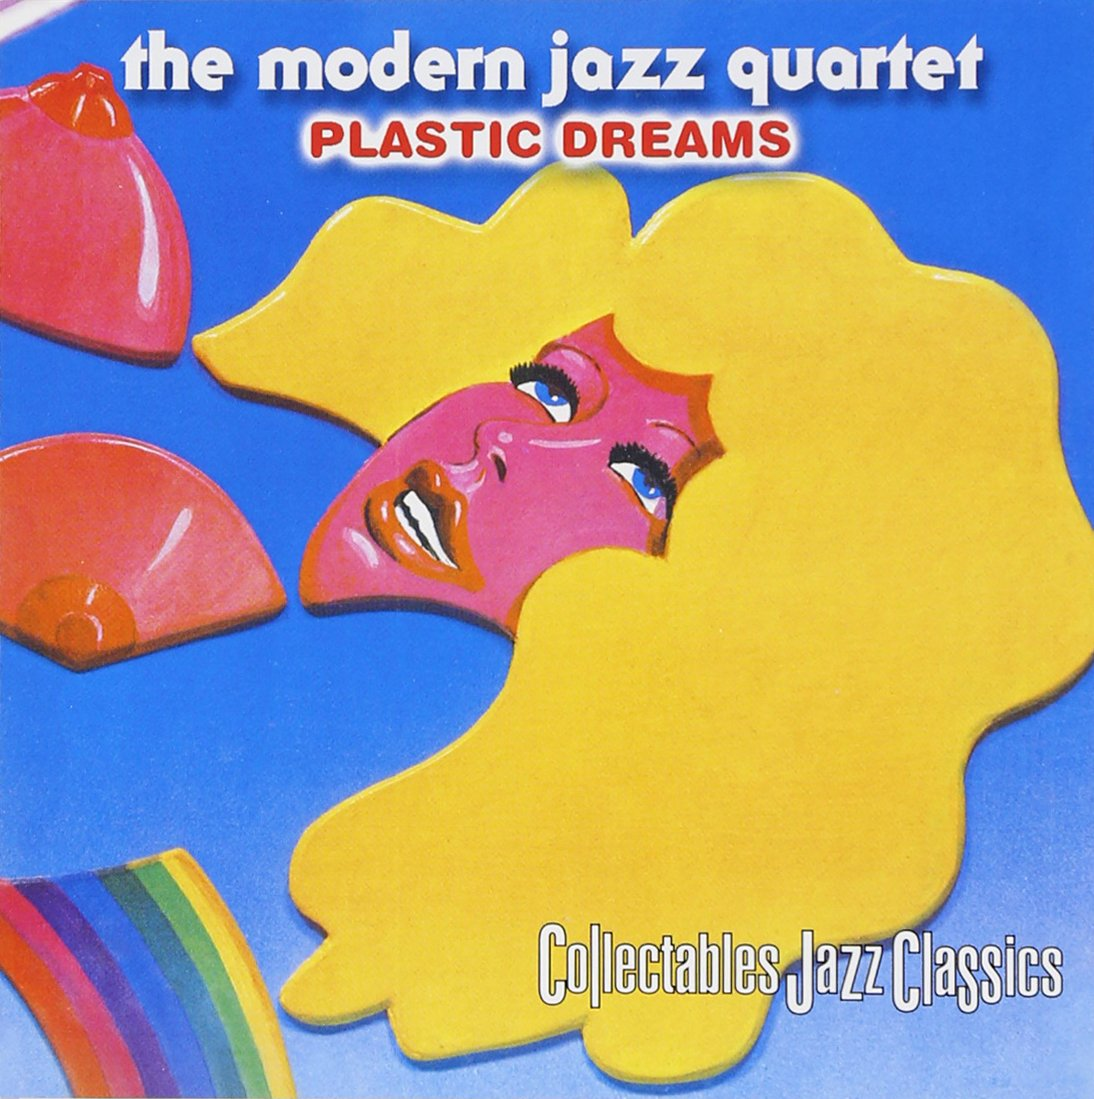 CD : The Modern Jazz Quartet - Plastic Dreams (CD)